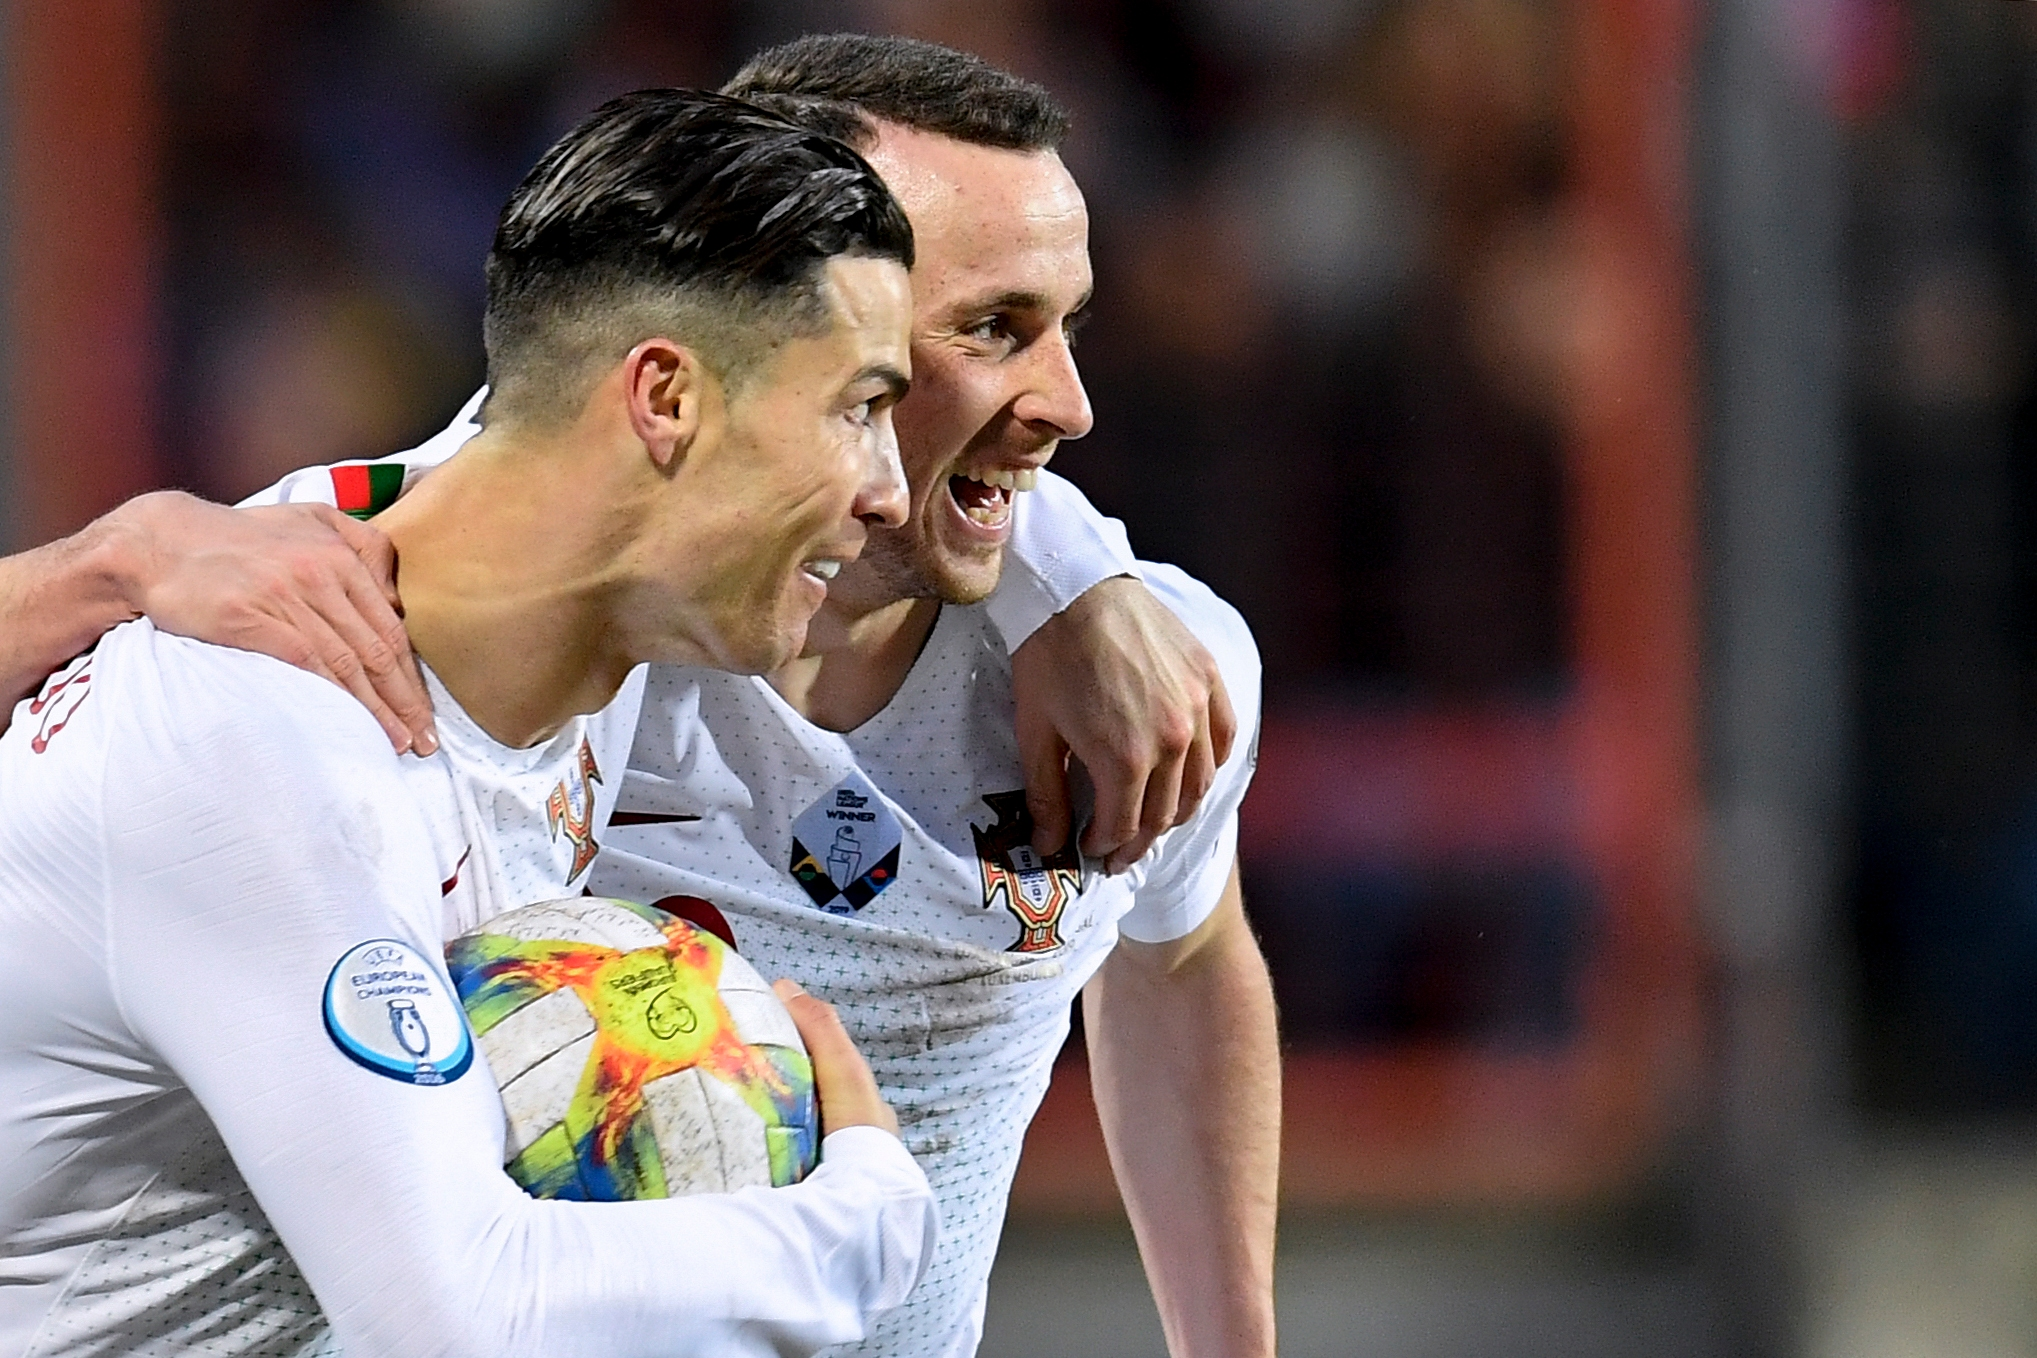 Jota has even scored as many headed goals as his compatriot, Cristiano Ronaldo